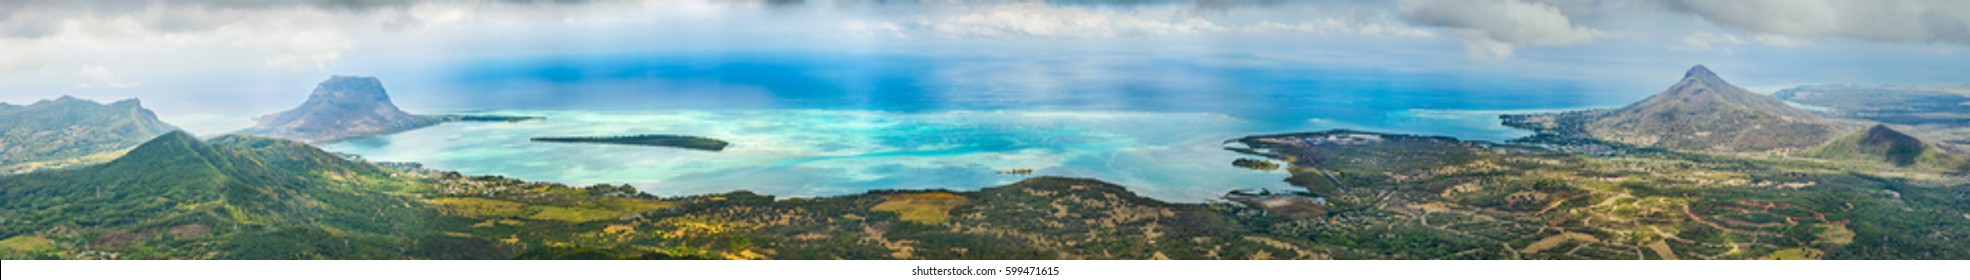 View from Piton de la Petite Riviere Noire, highest peak of Mauritius.  Panorama